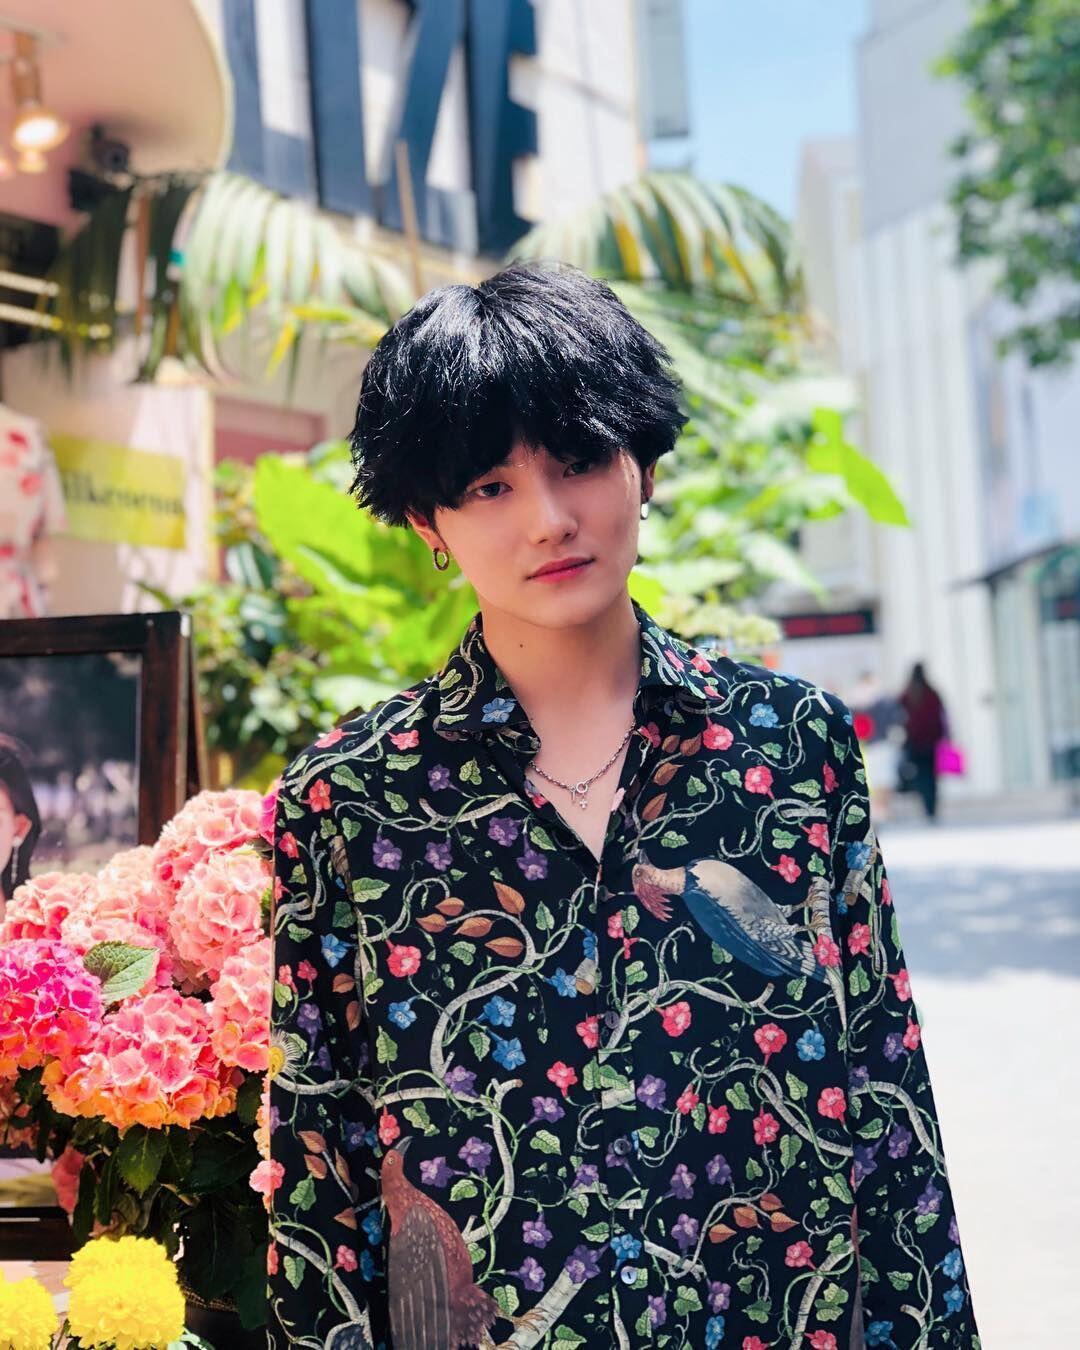 10 Potret Kenji, Cowok Jepang yang Mirip V dan Suga BTS!